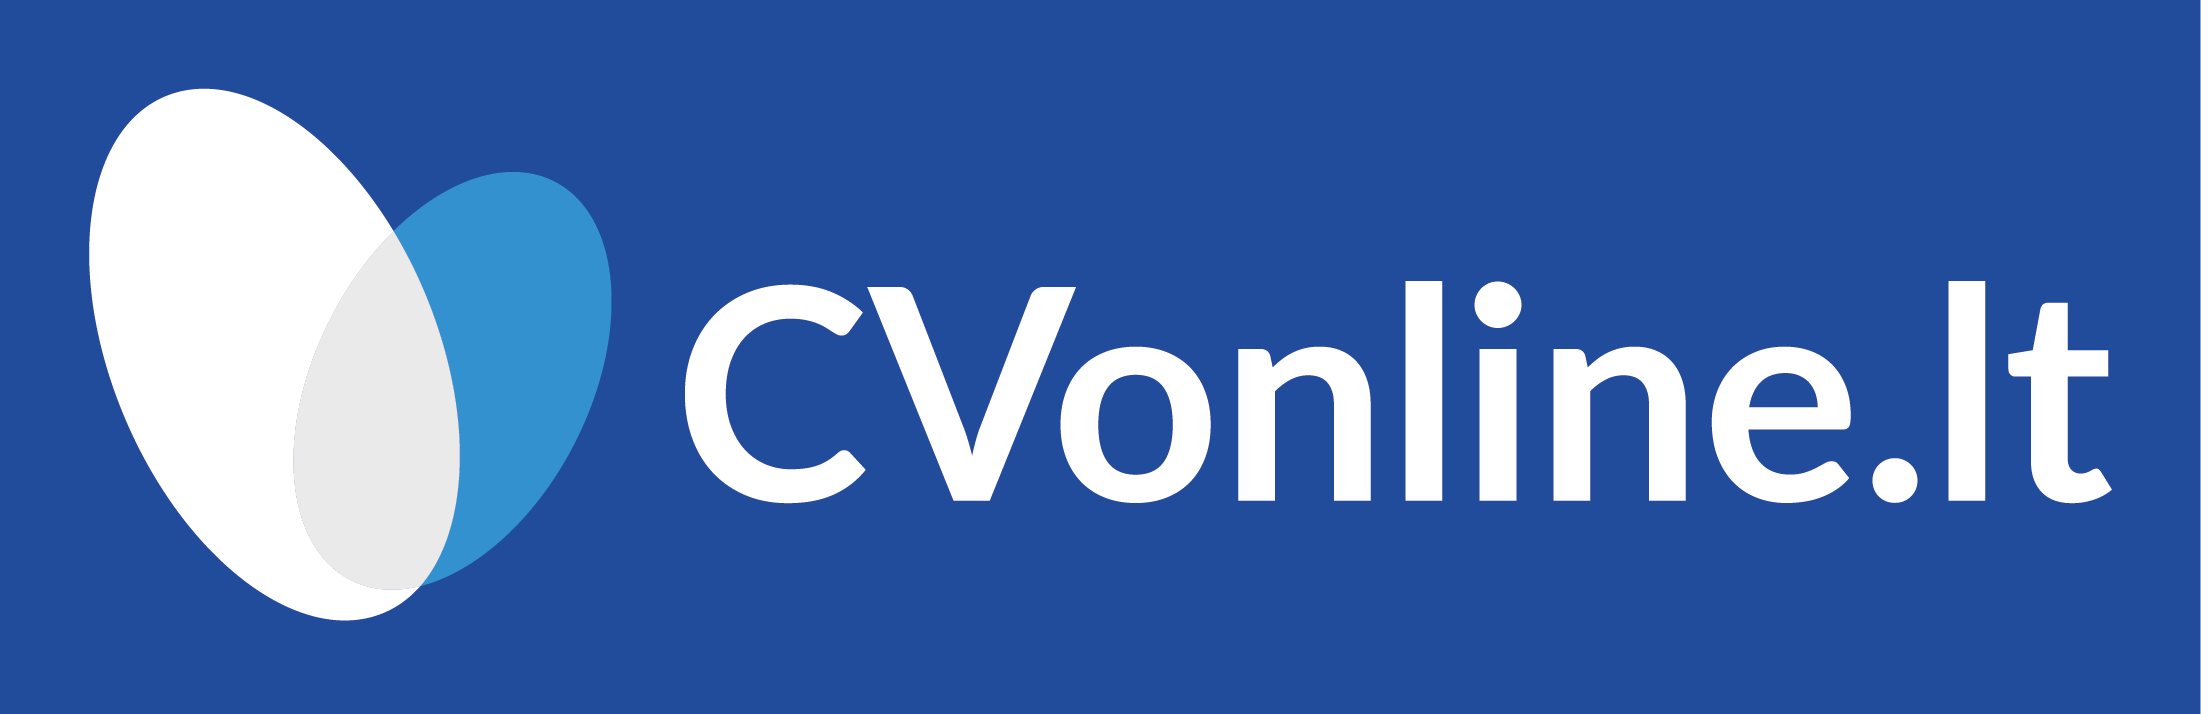 CVOnline.lt